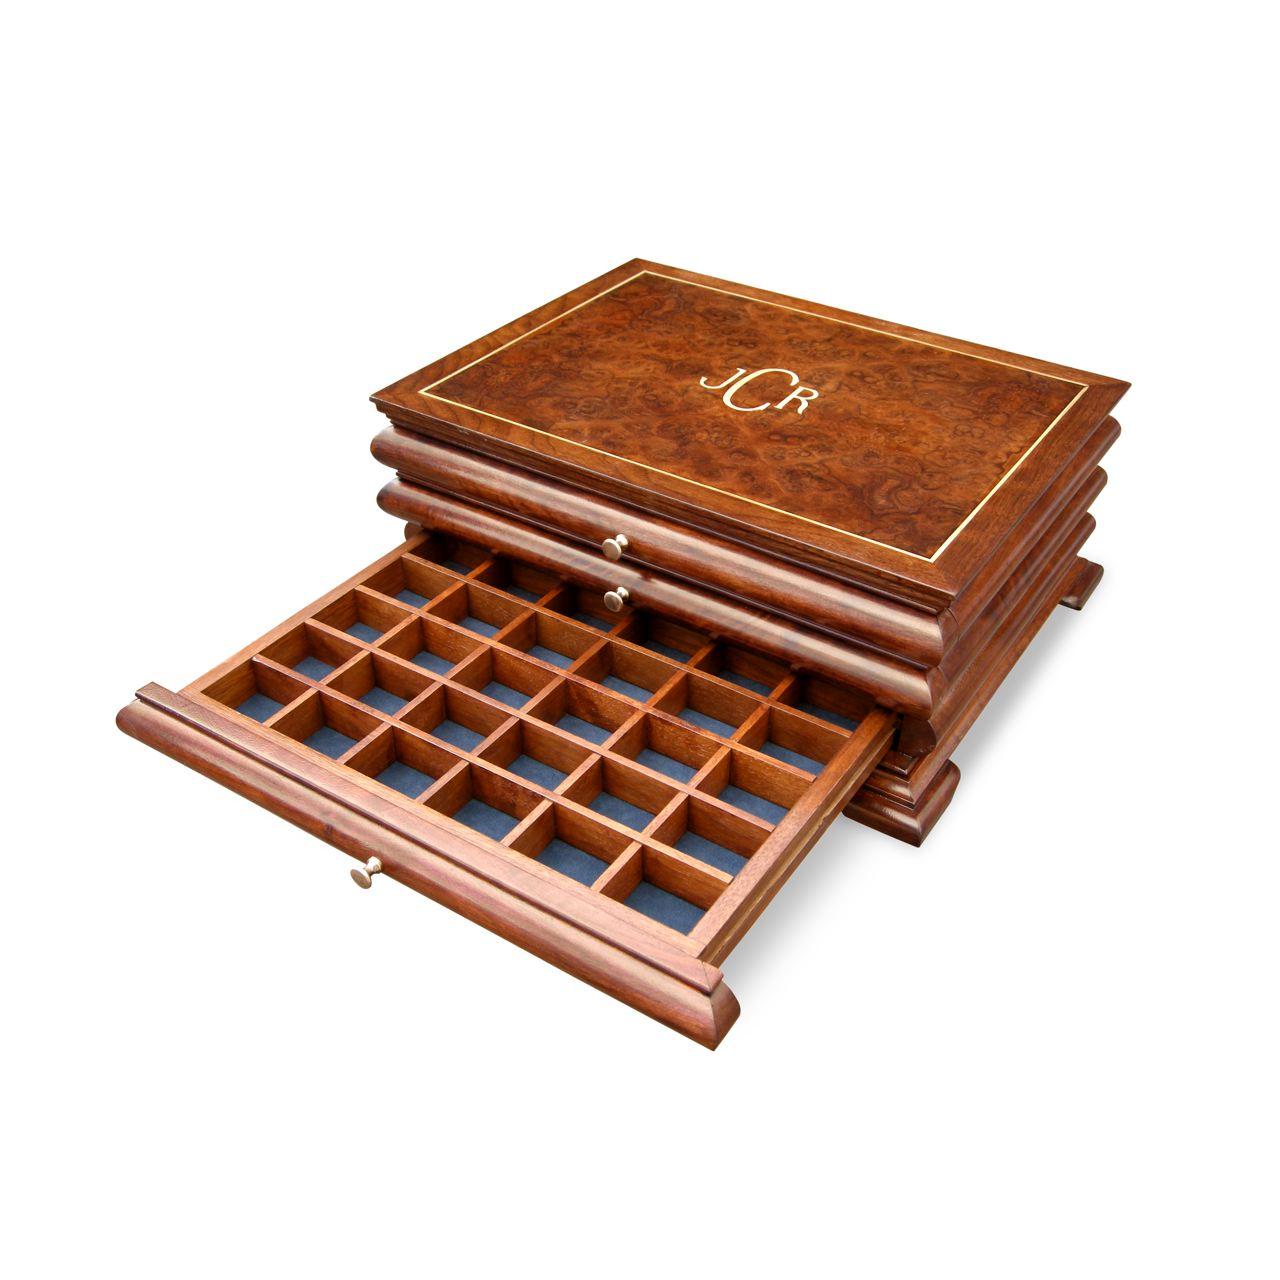 cufflin box 2.jpg